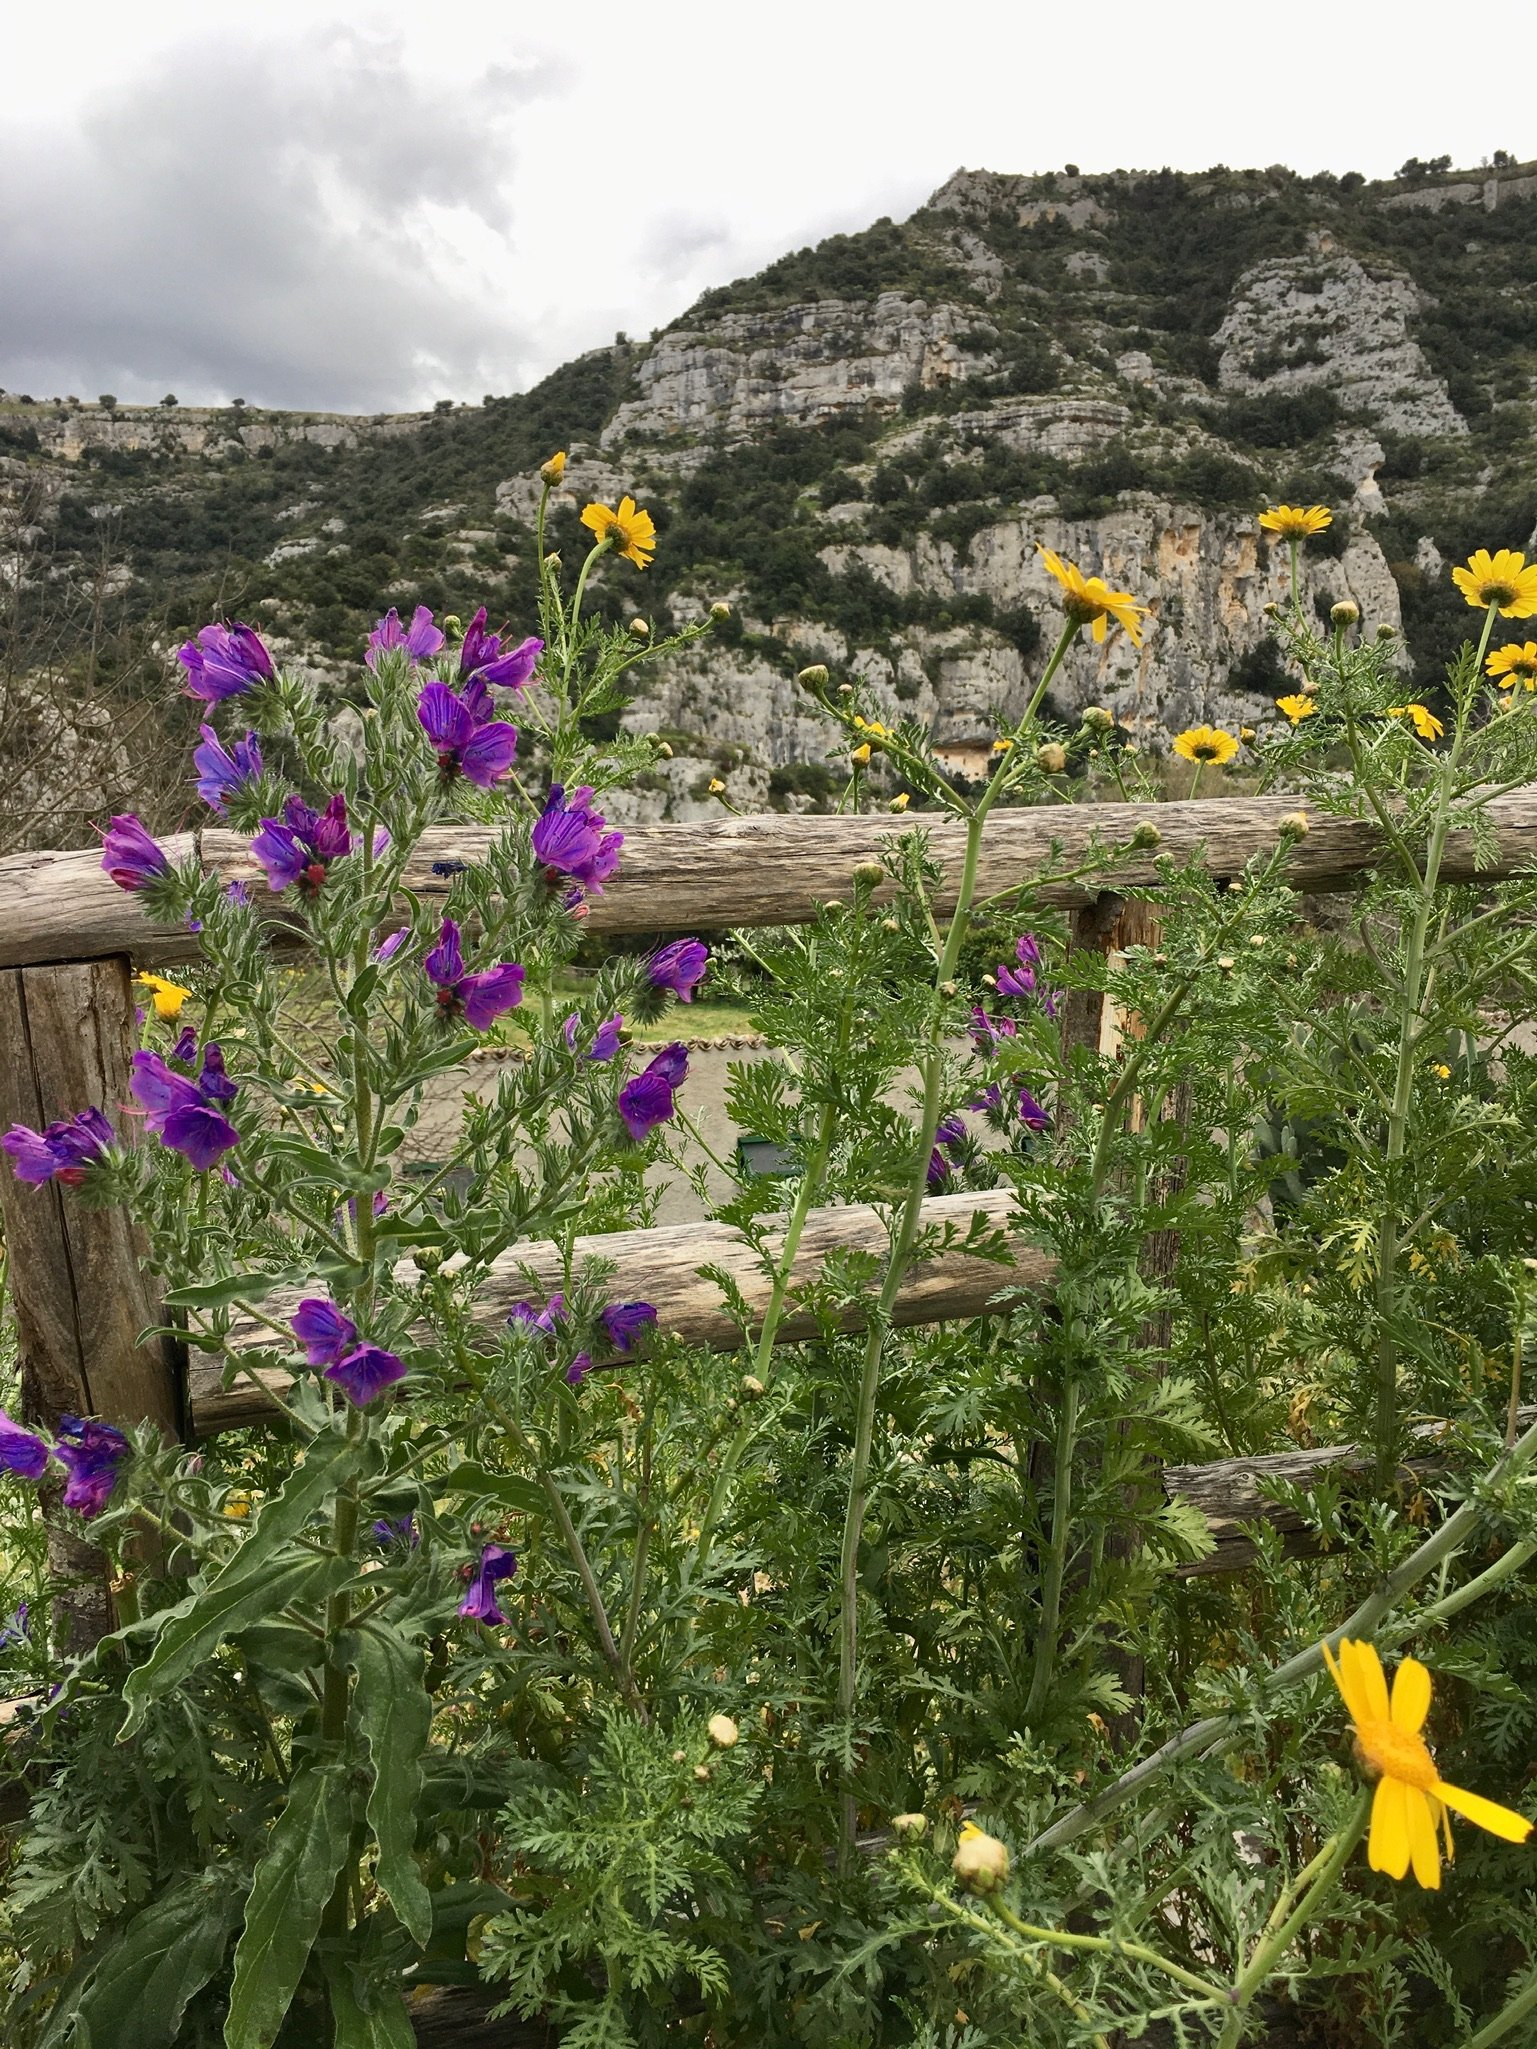 Wanderung im Pantalica Naturreservat